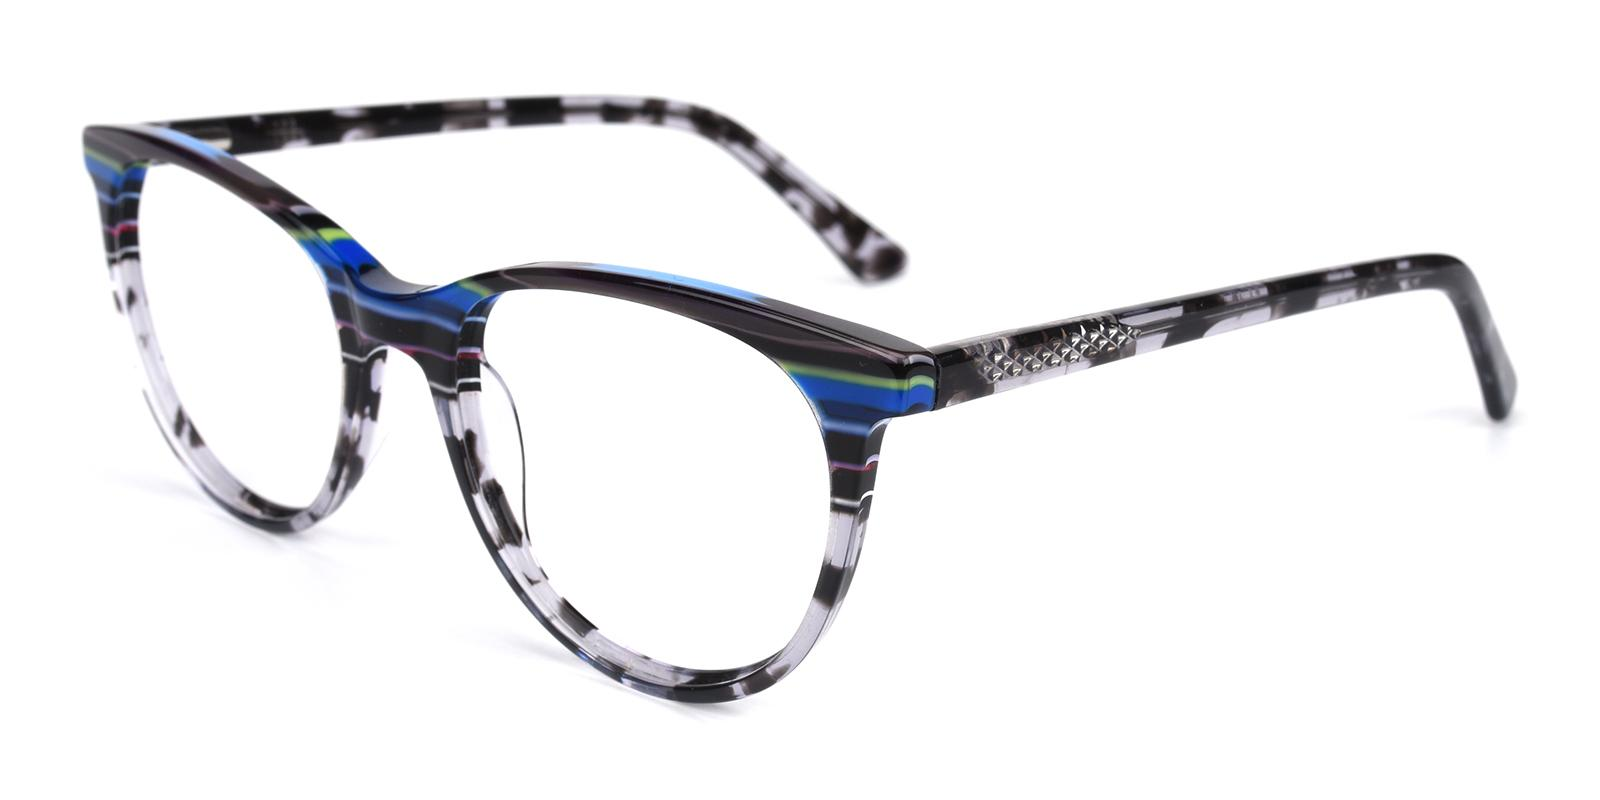 Lankas-Black-Cat-Acetate-Eyeglasses-additional1